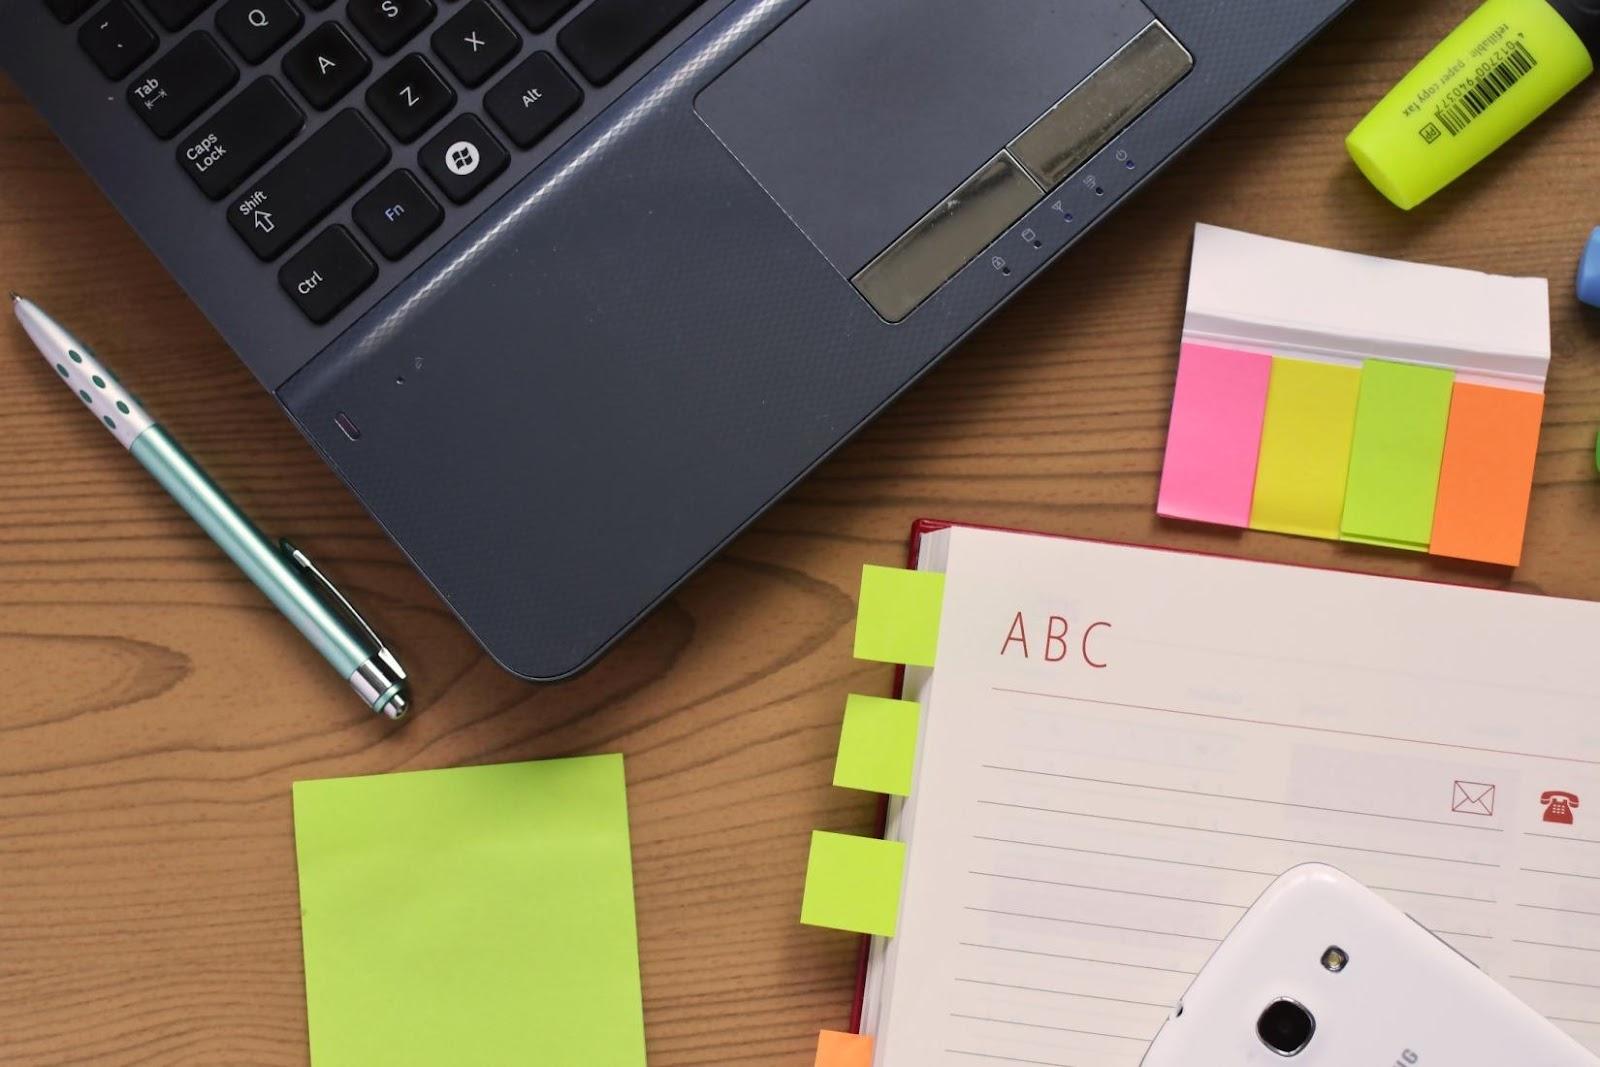 desk-laptop-notebook-3059.jpg